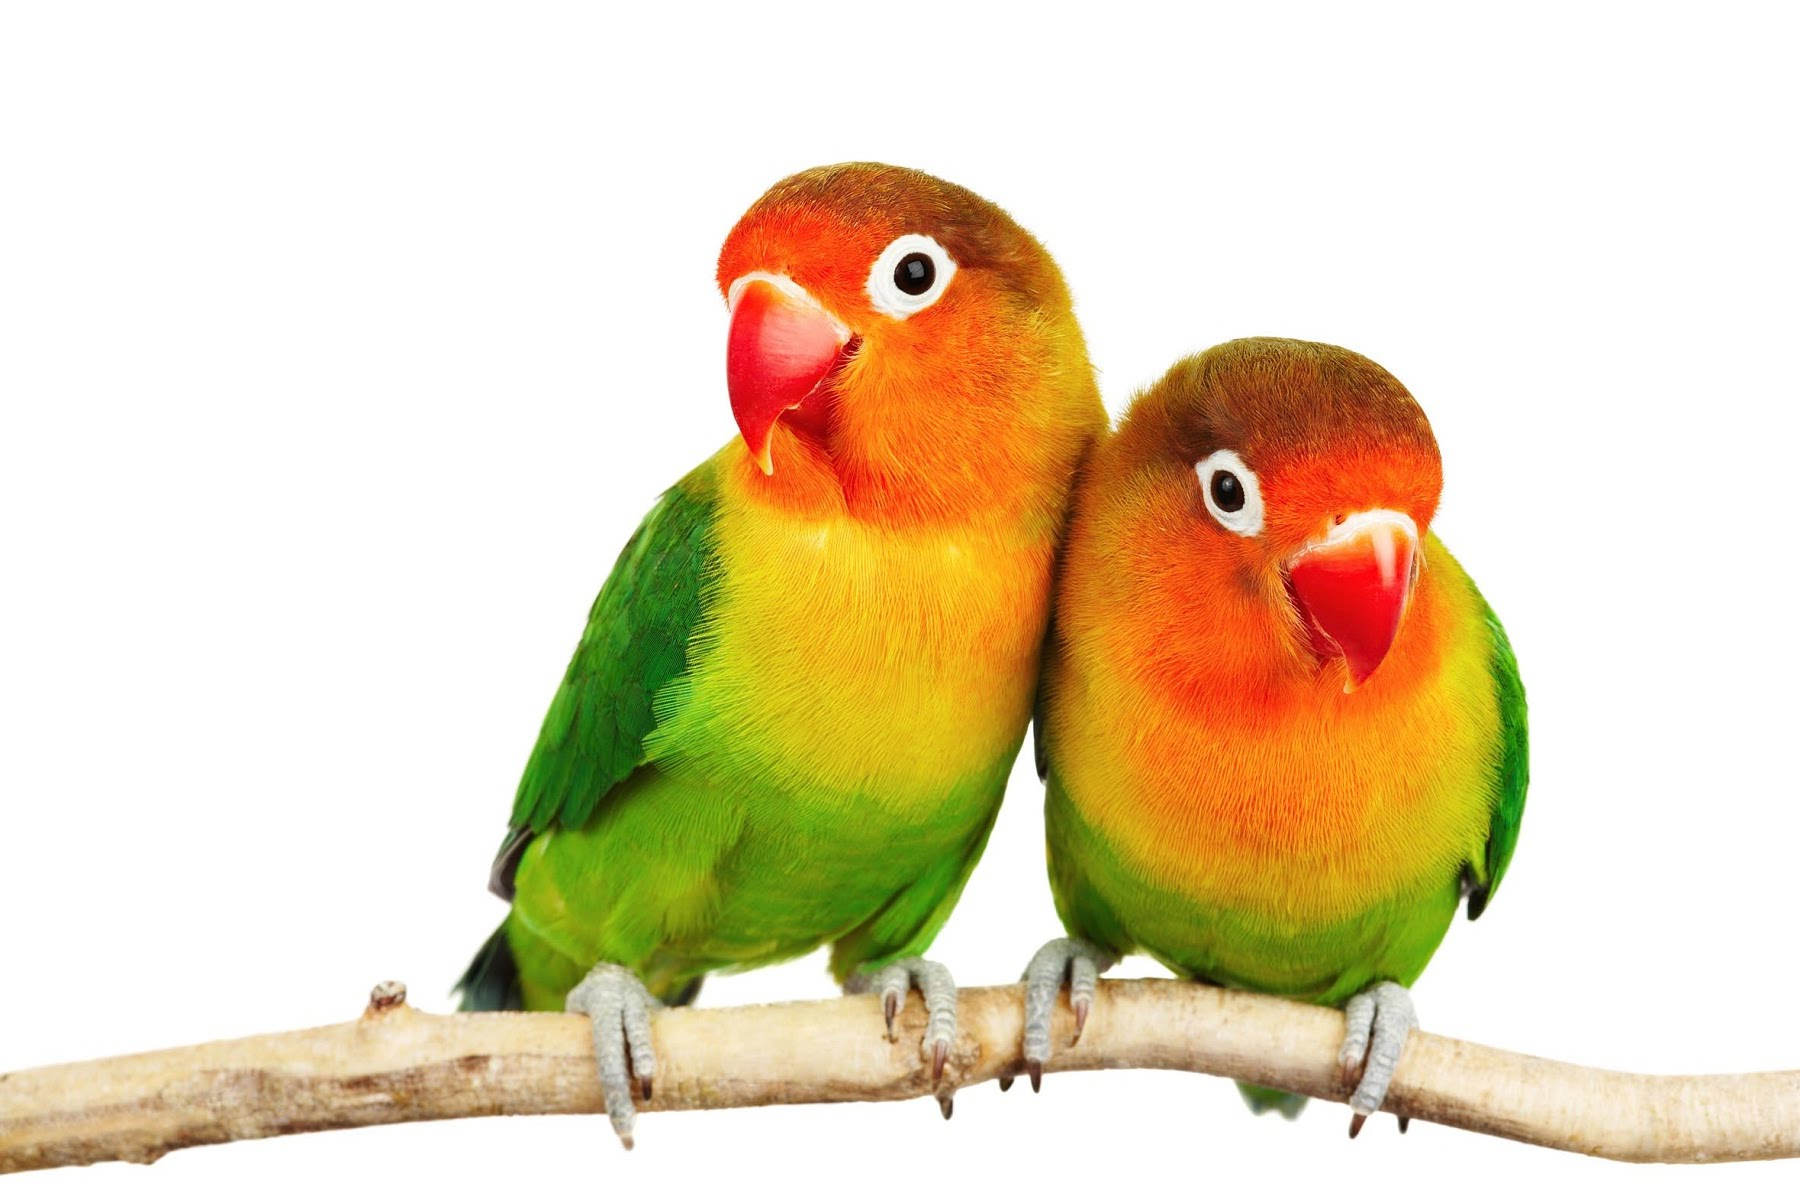 Lovebird Png Hd Transparent Lovebird Hd Png Images Pluspng